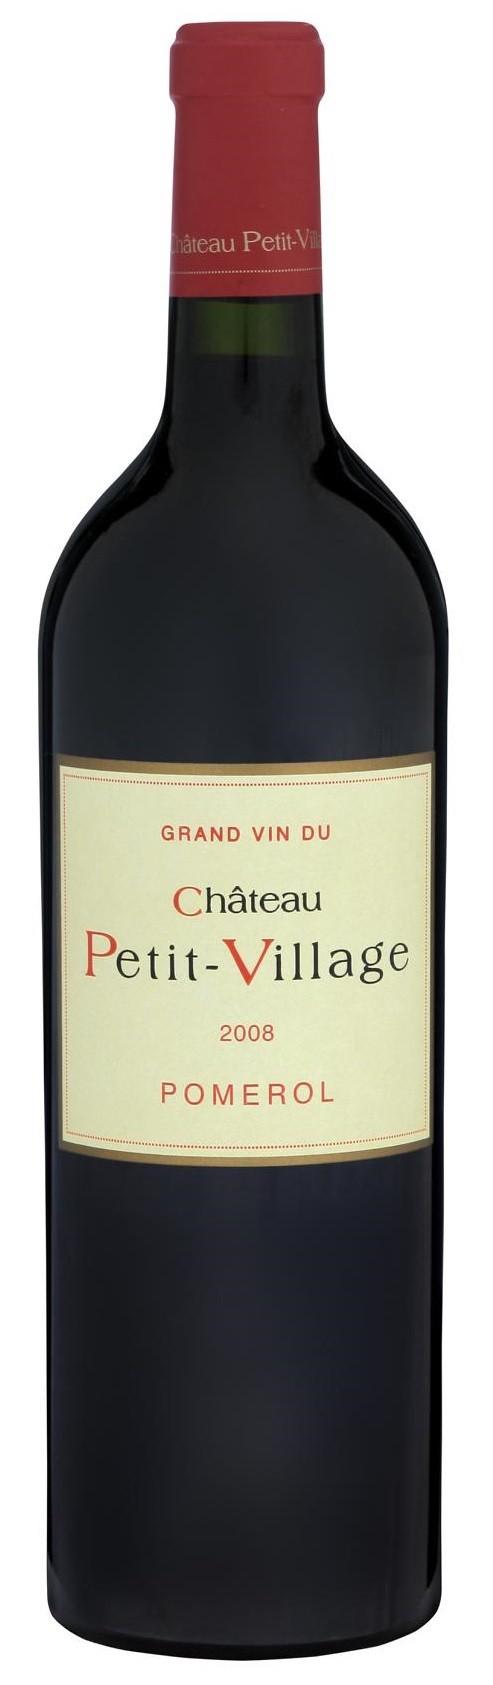 Chateau Petit Village 1998, Pomerol